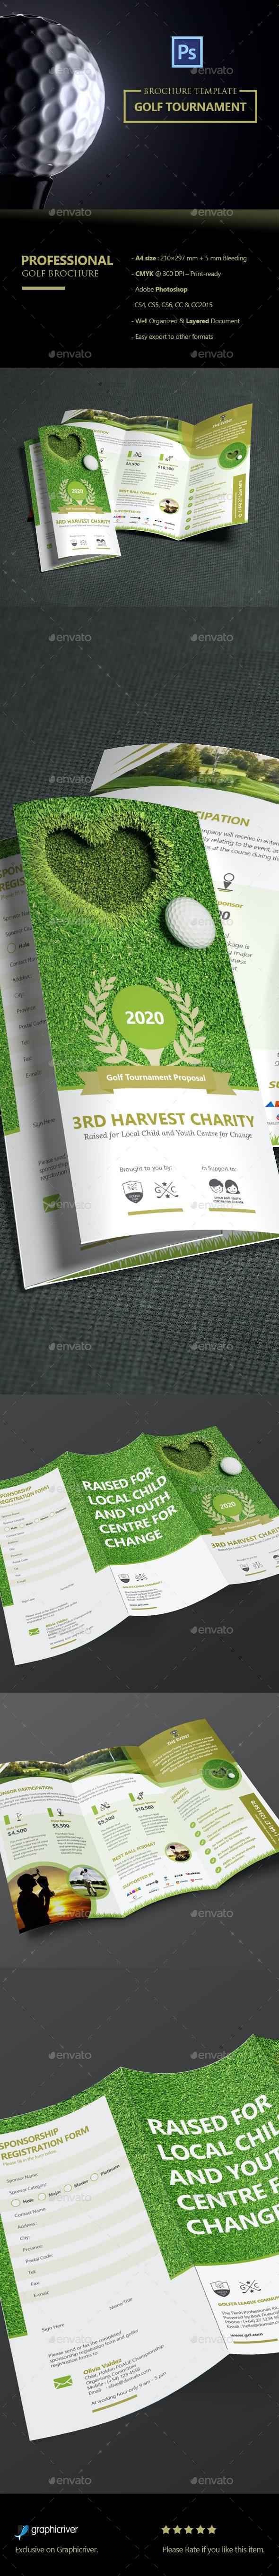 Clean Trifold Golf Tournament Brochure  - Informational Brochures